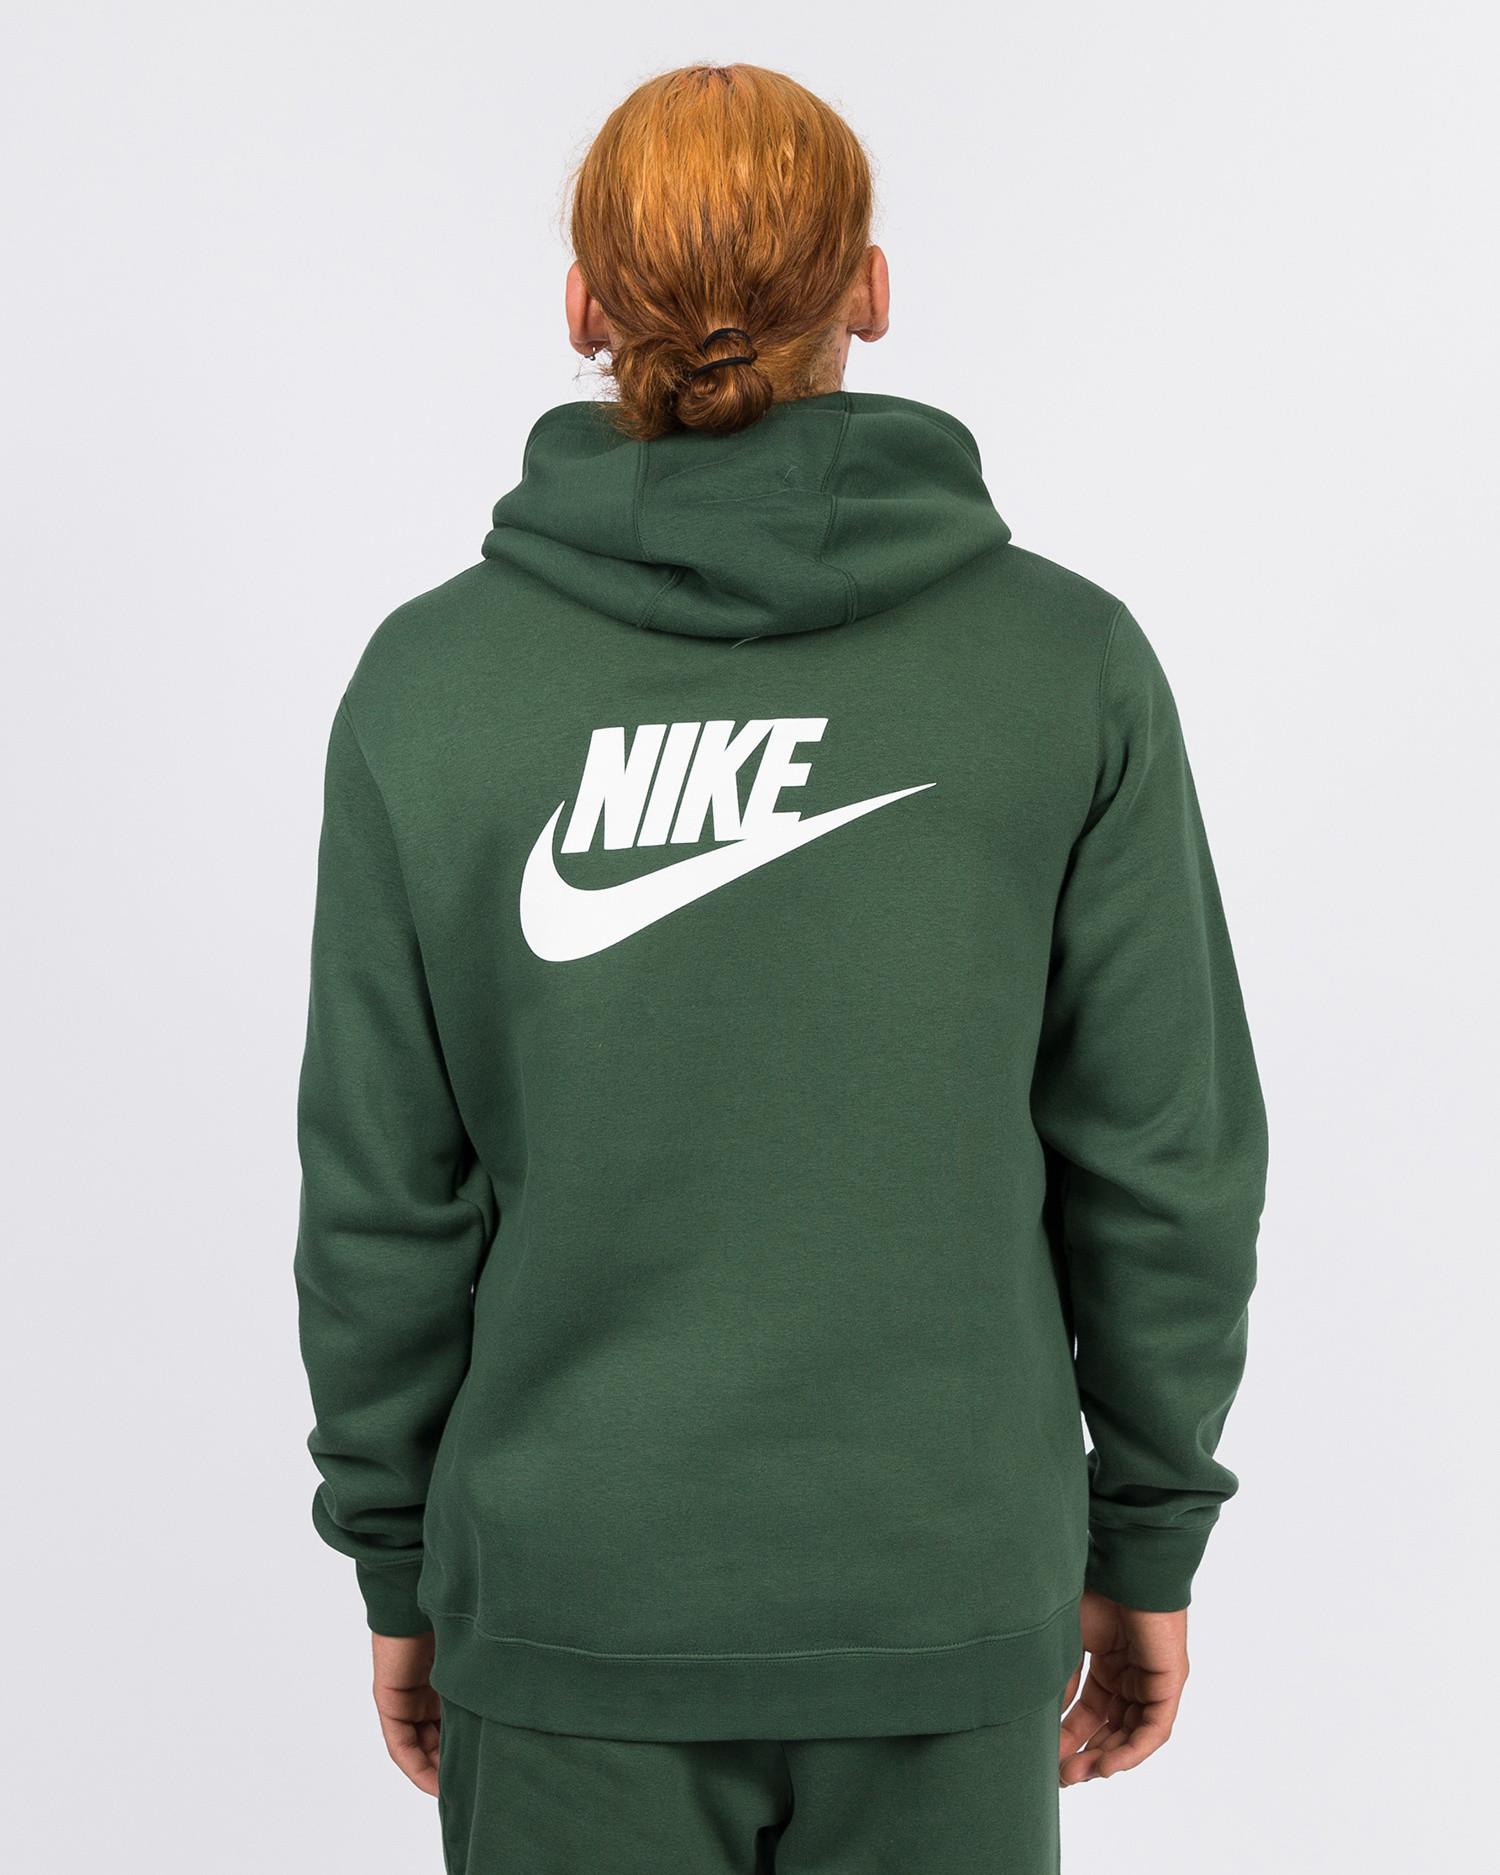 Nike Stranger Things Club Hoodie po bb s.t. Fir/white/sail